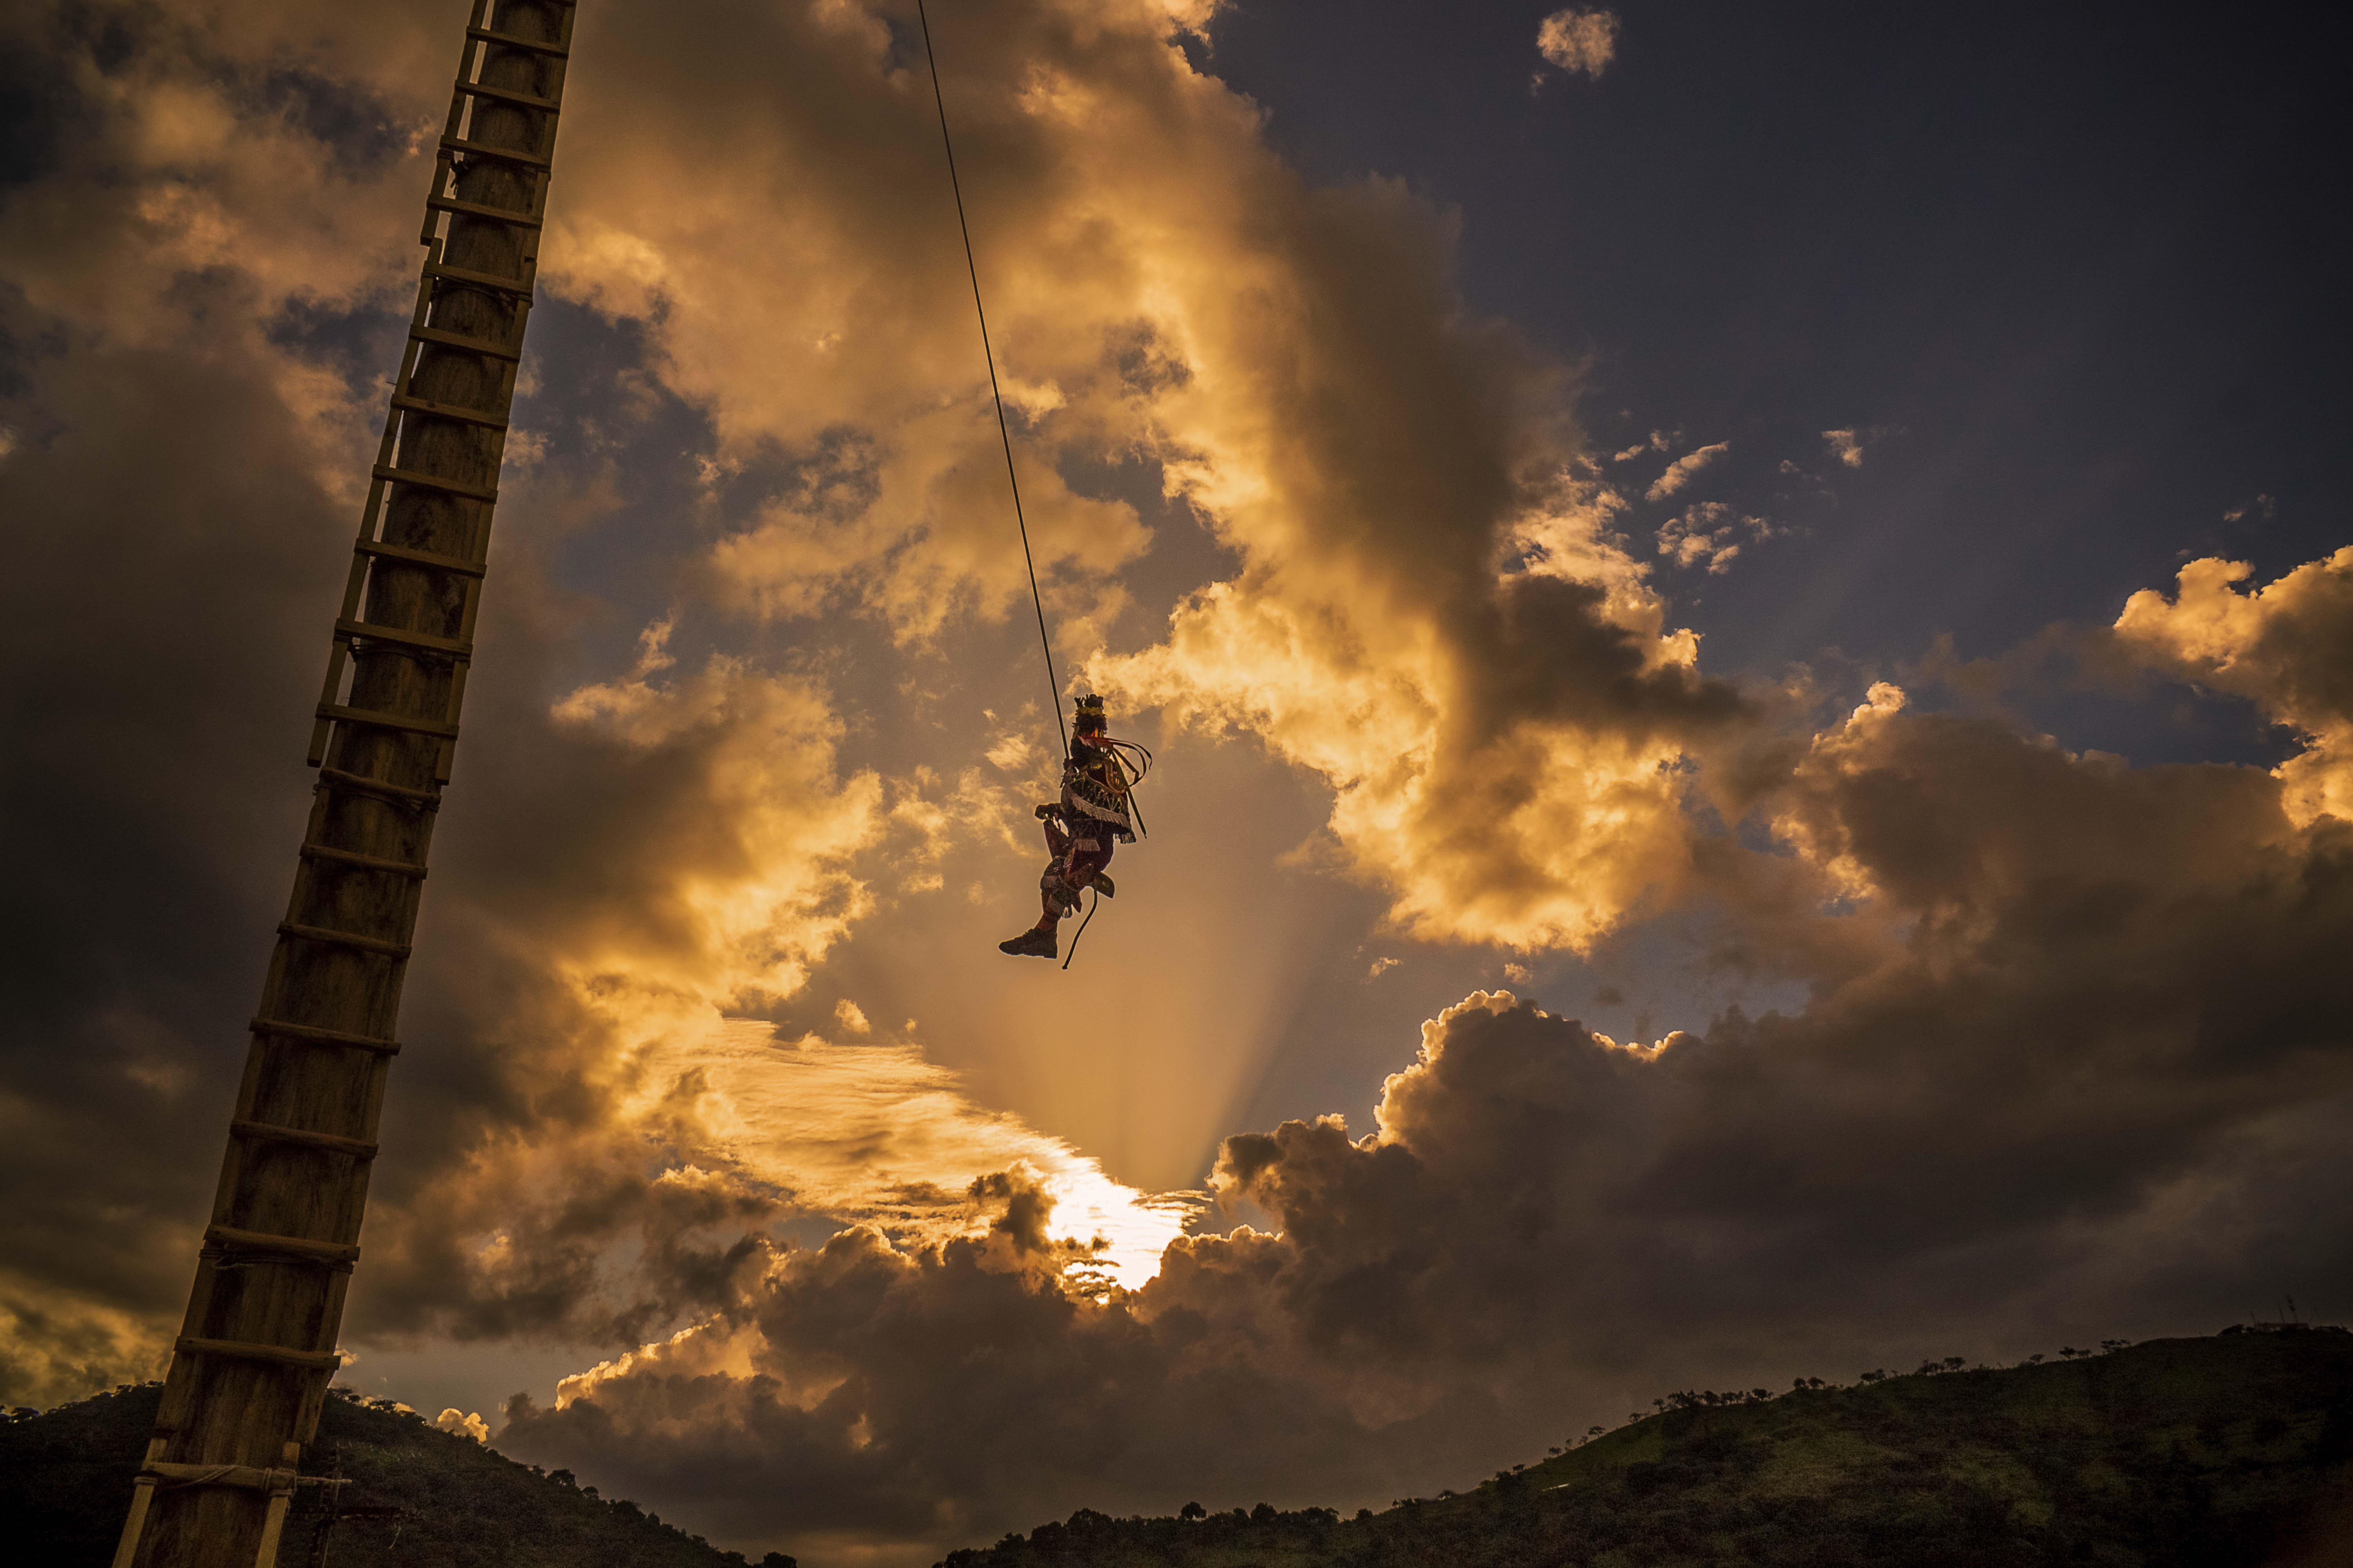 Palo Volador Chichicastenango